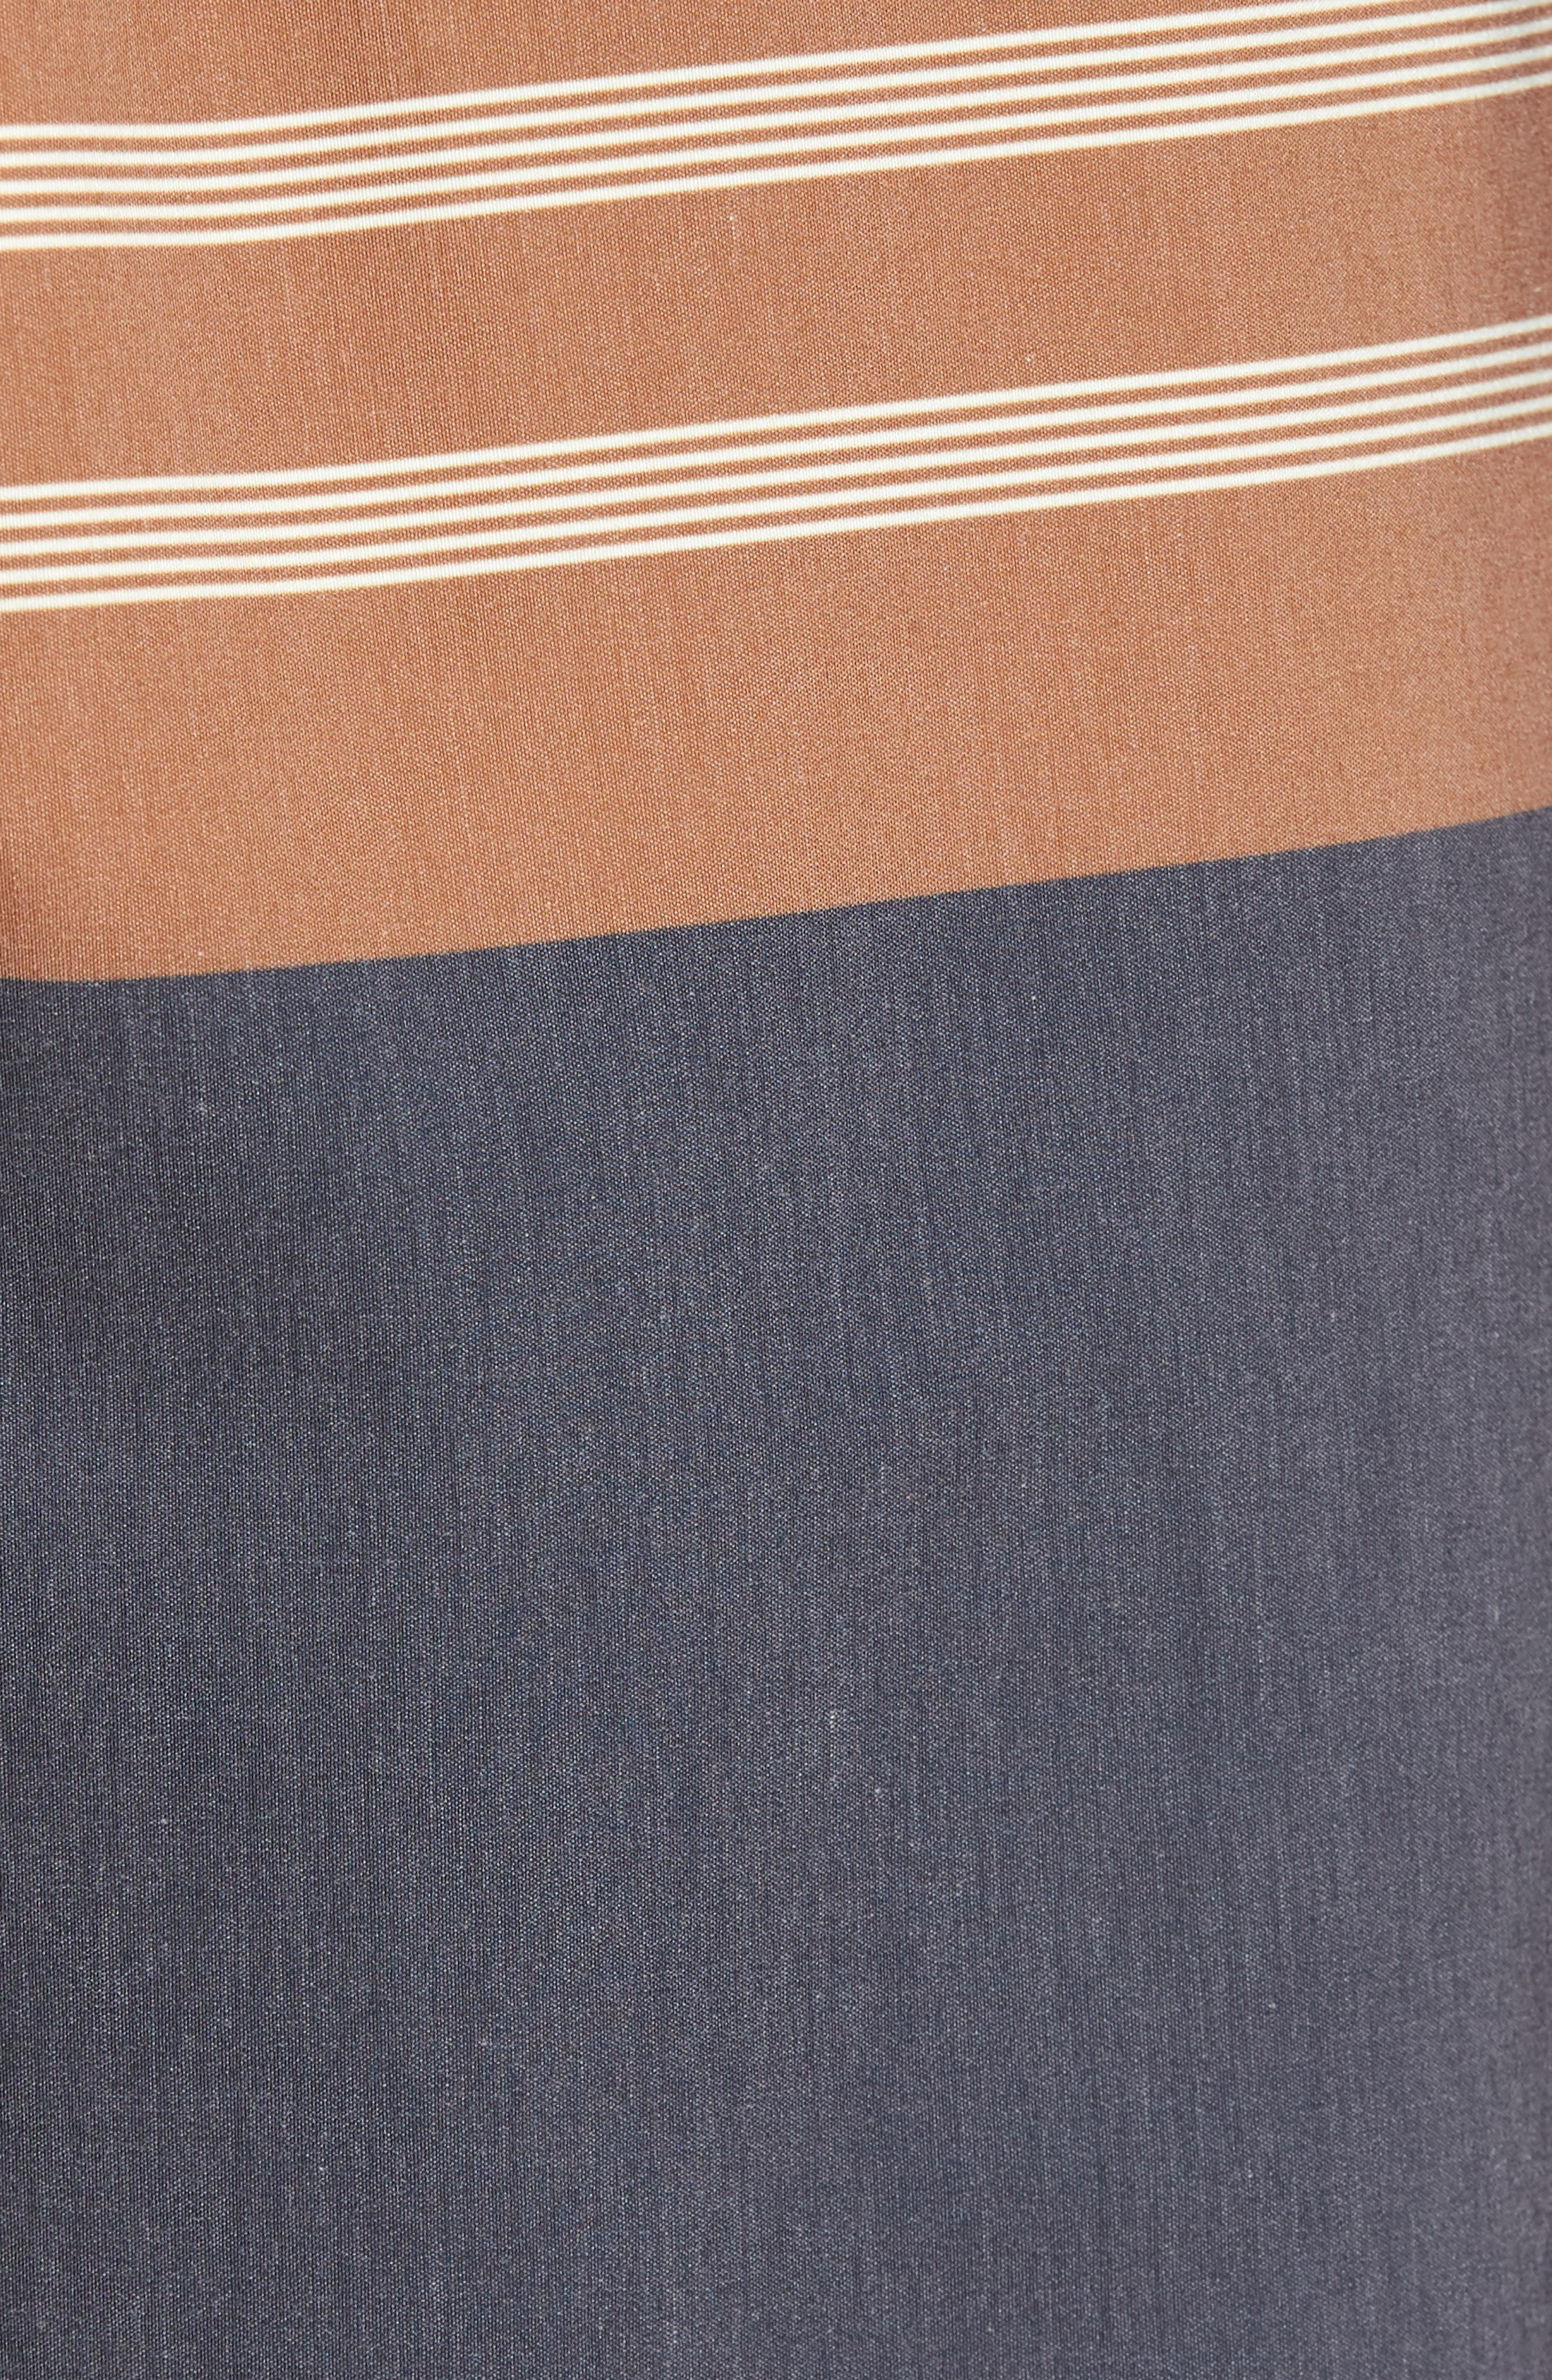 Pier Board Shorts,                             Alternate thumbnail 13, color,